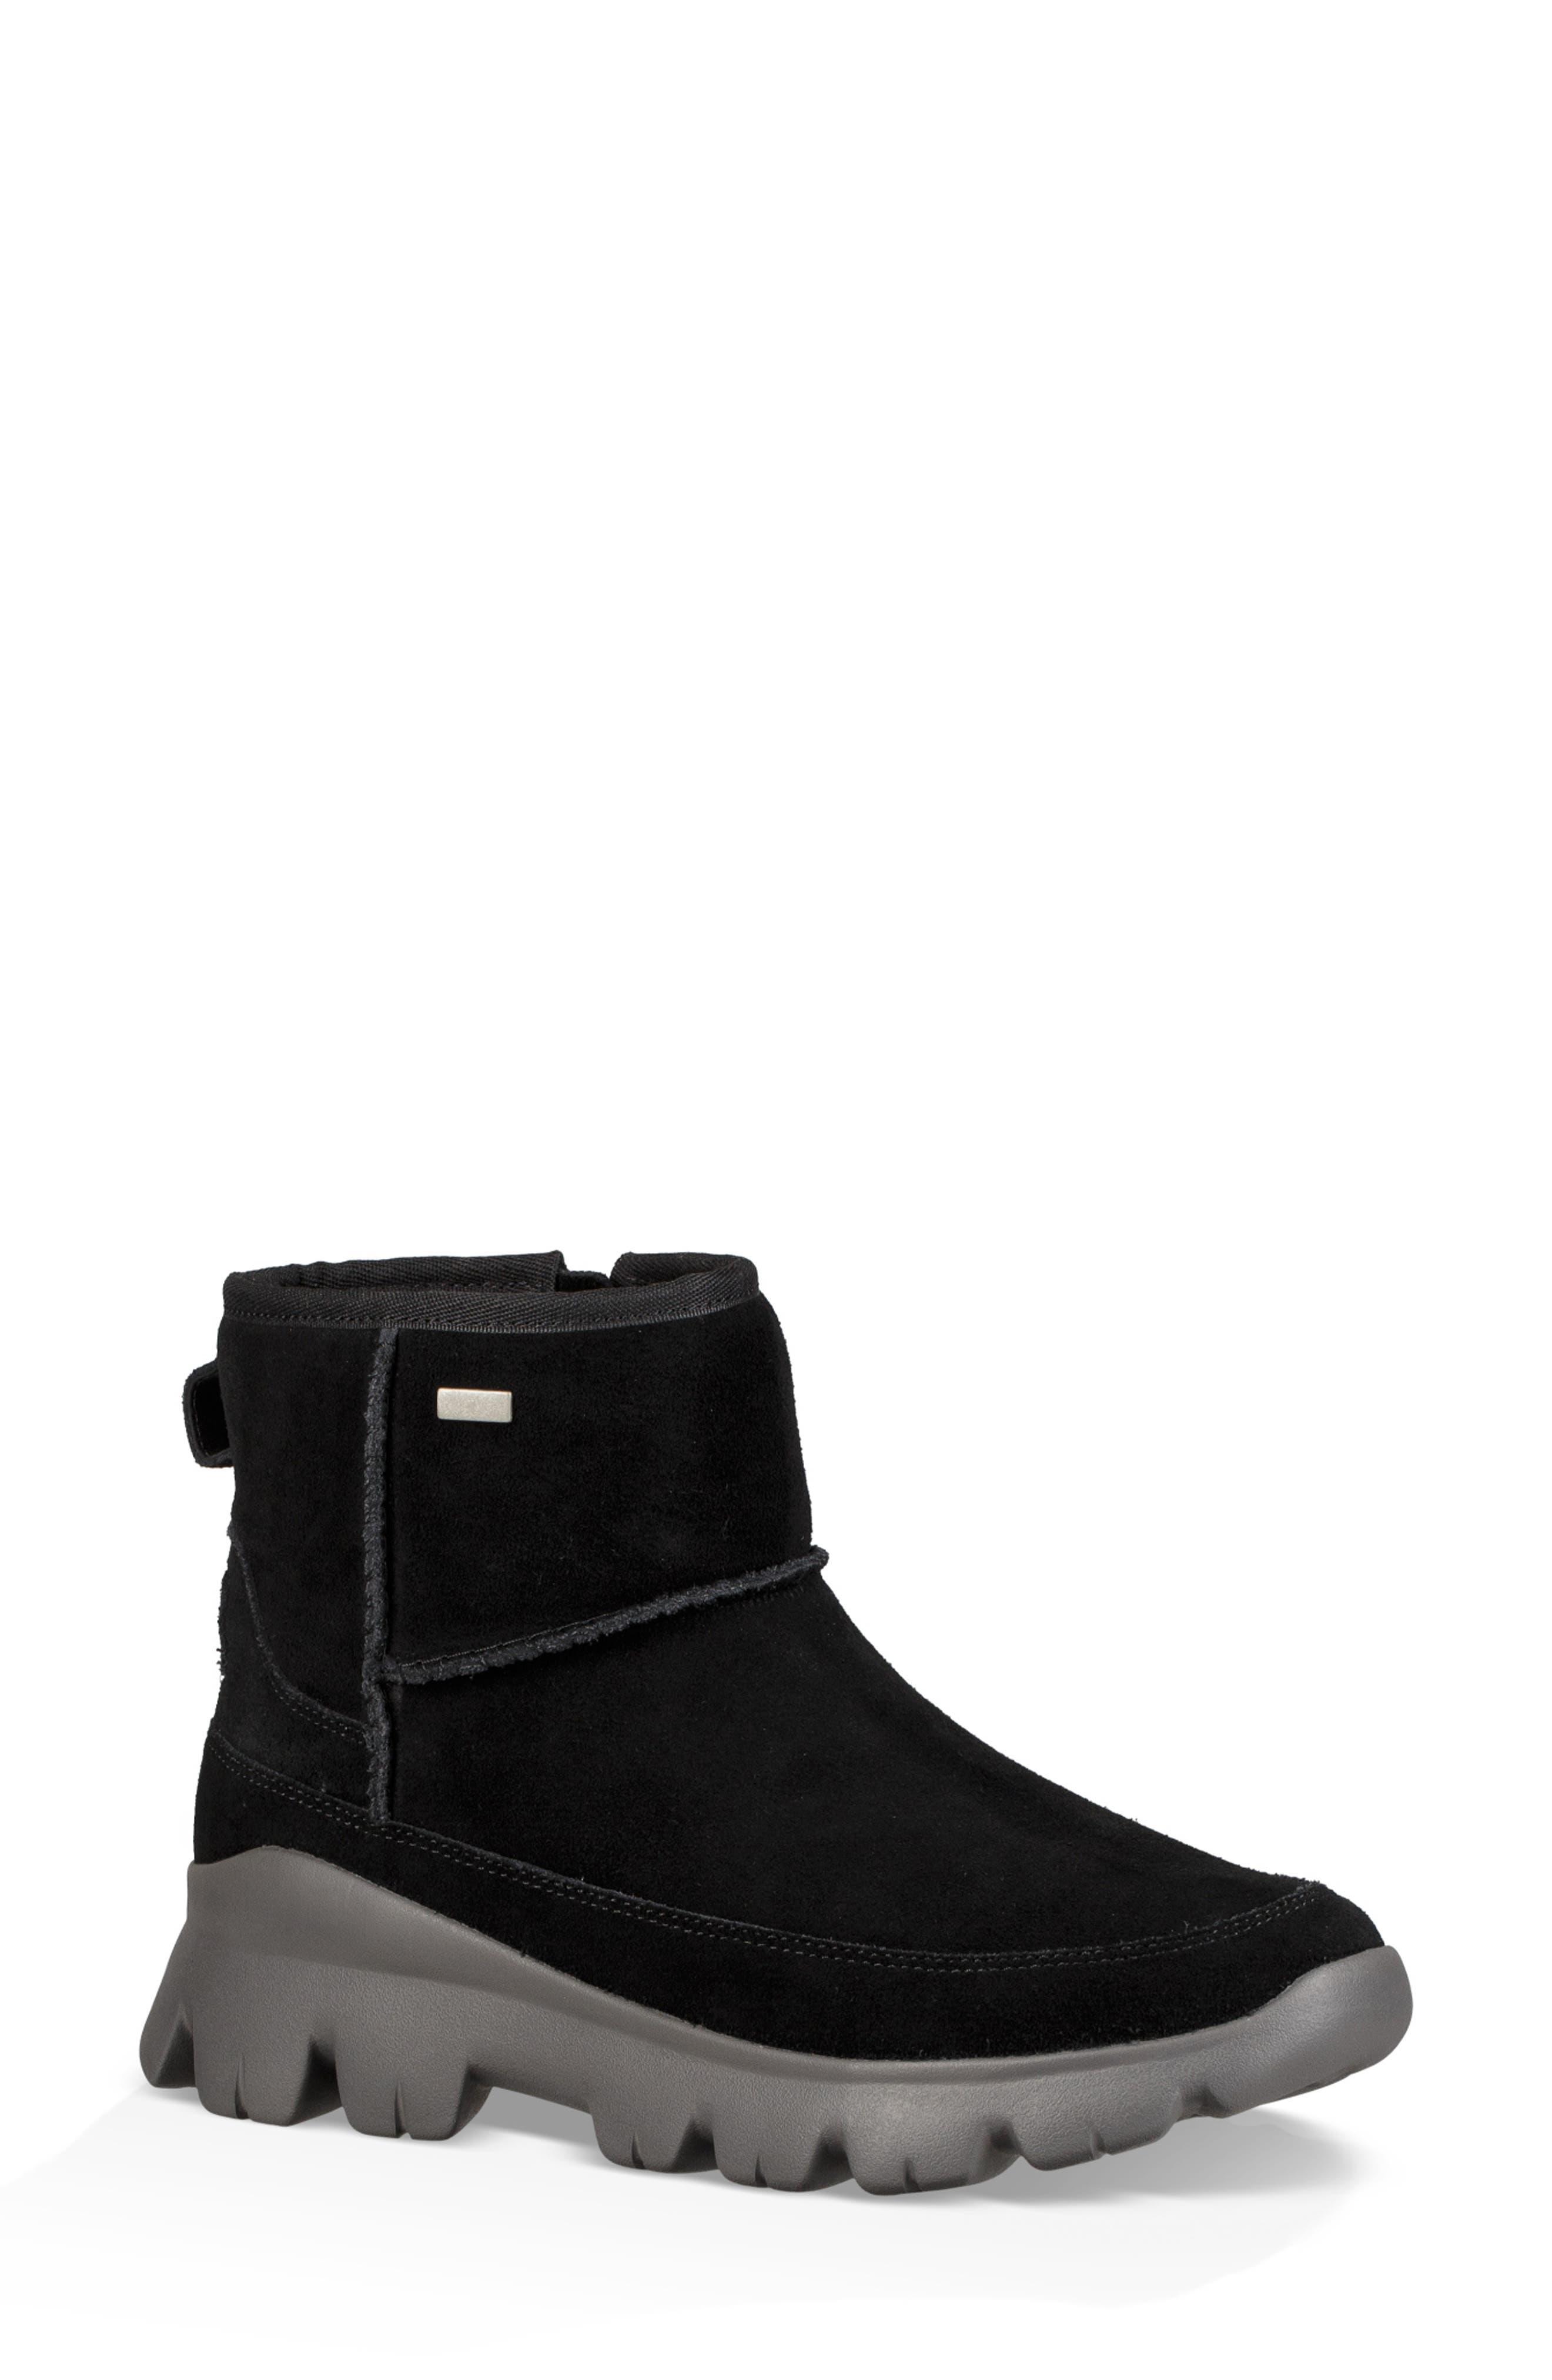 Palomar Waterproof Sneaker Bootie,                             Main thumbnail 1, color,                             BLACK/ CHARCOAL SUEDE